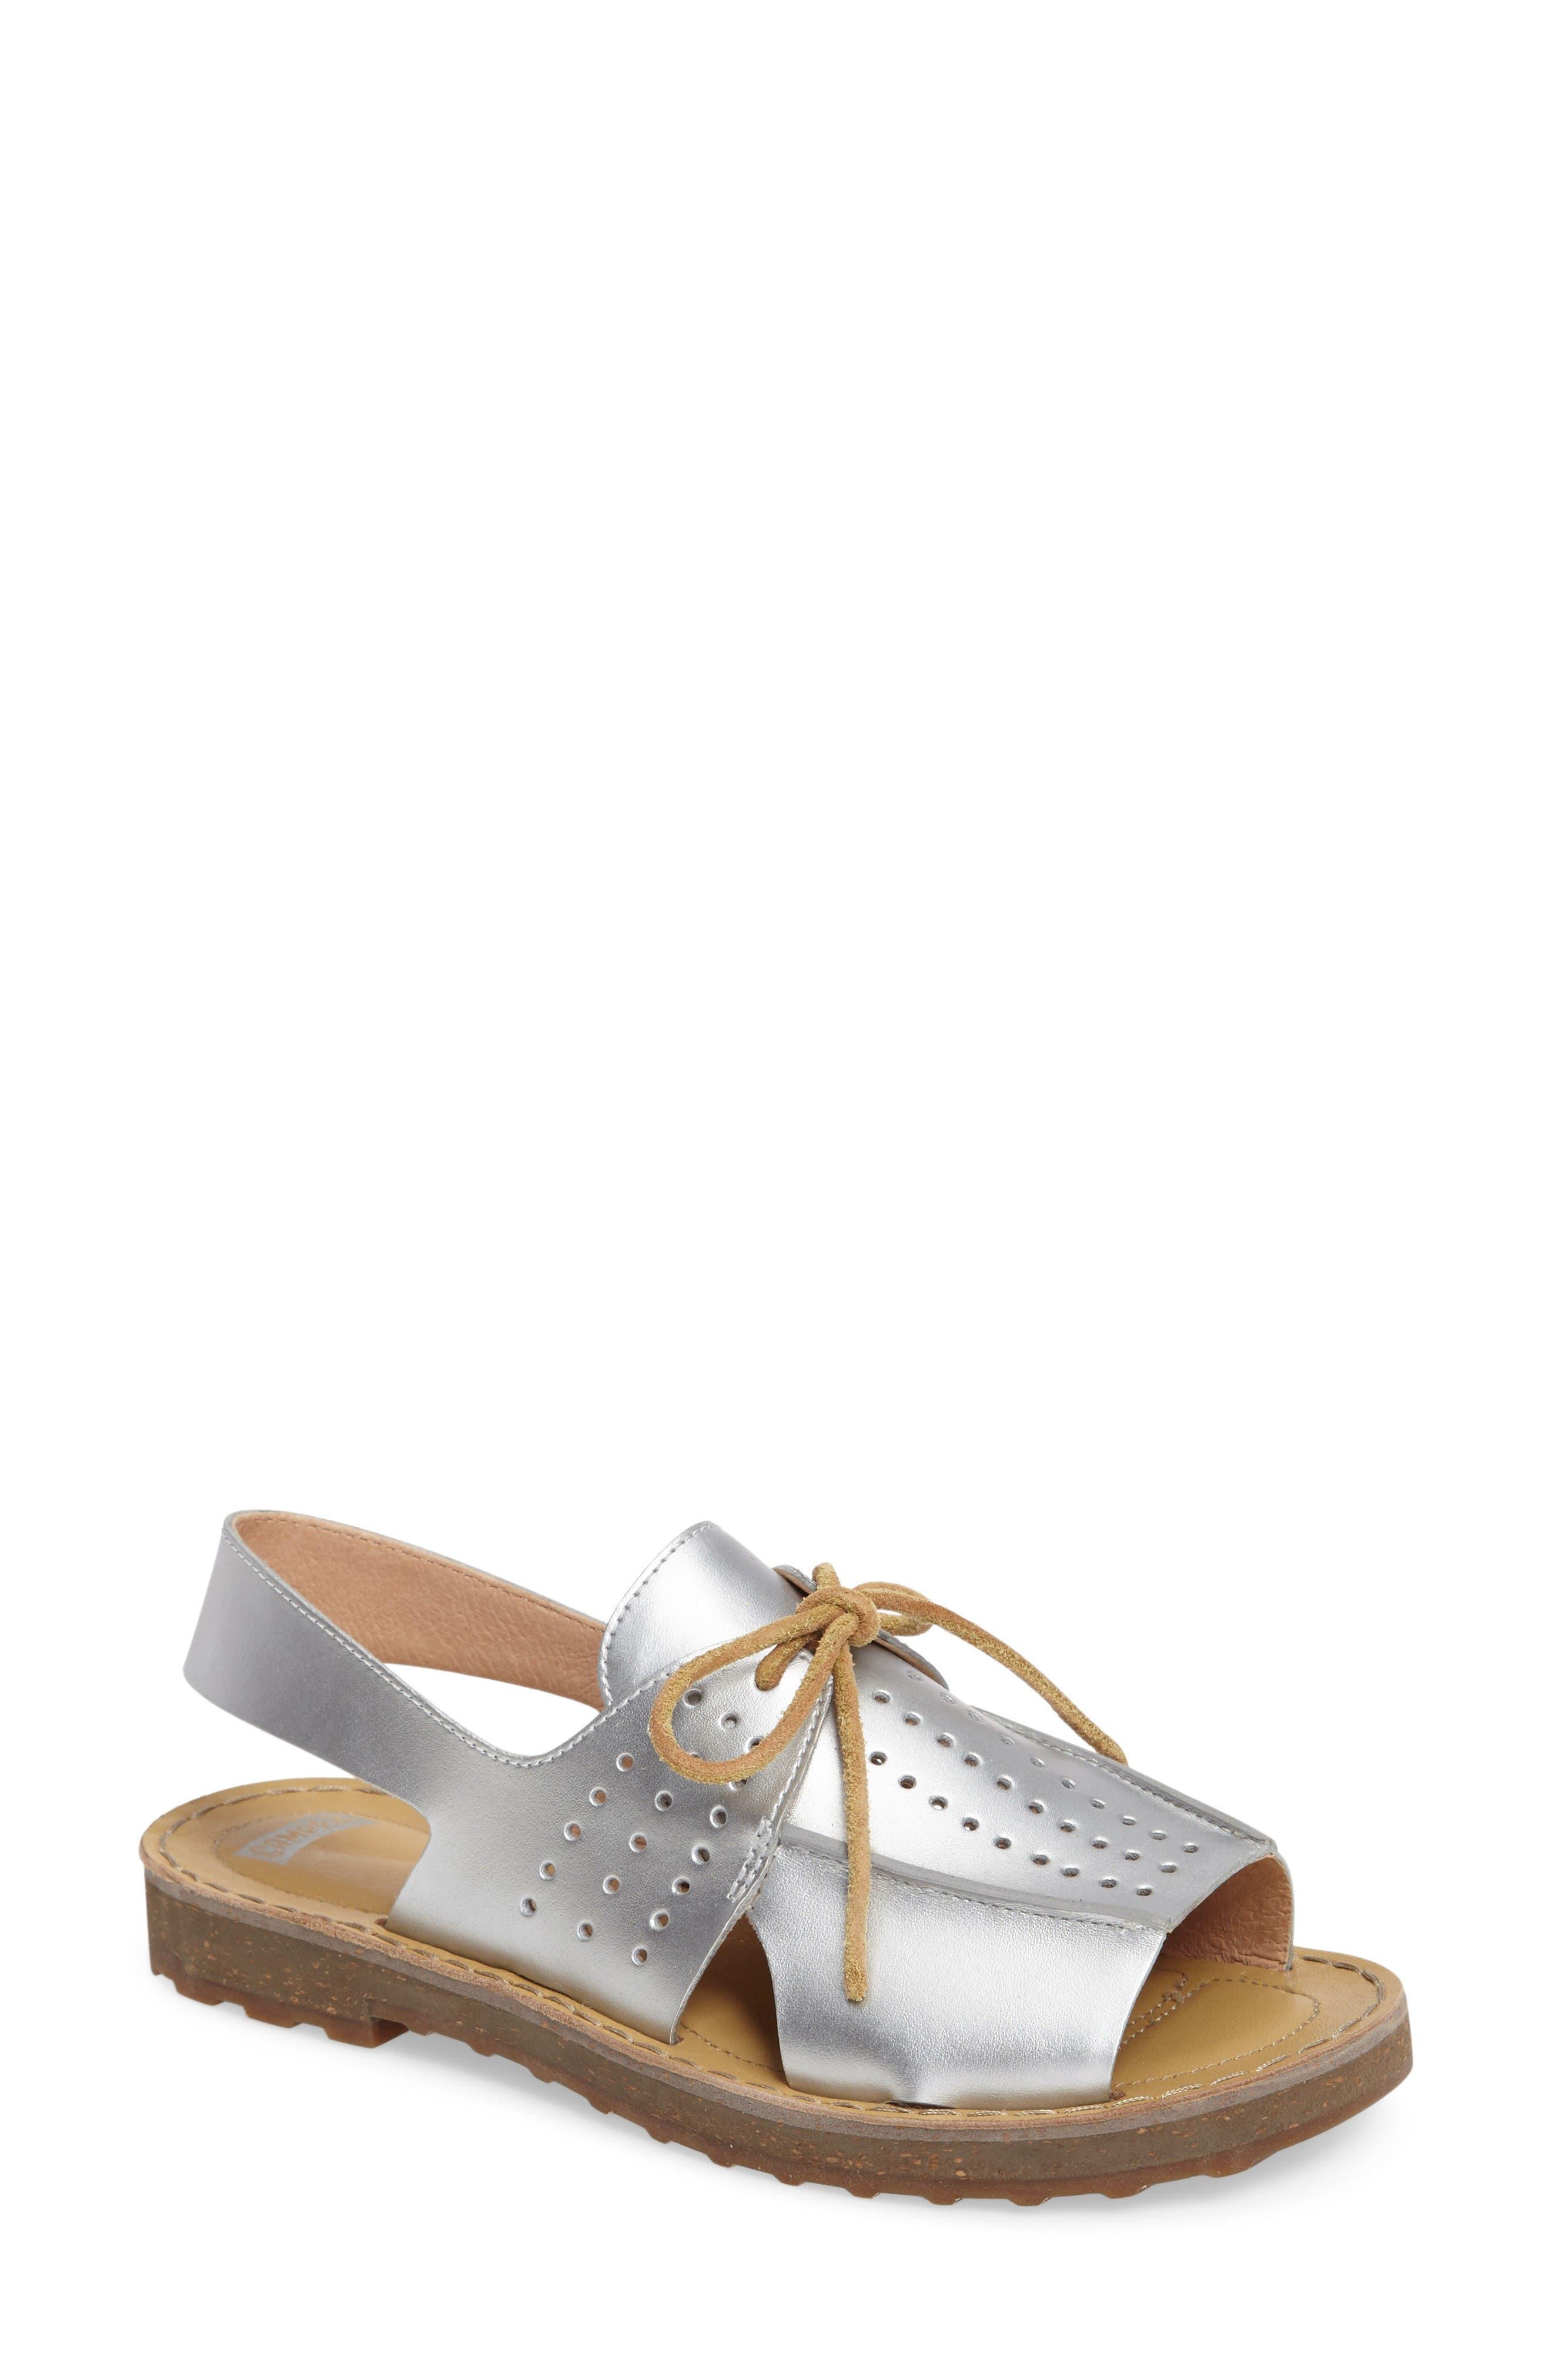 Alternate Image 1 Selected - Camper Lace-Up Sandal (Women)